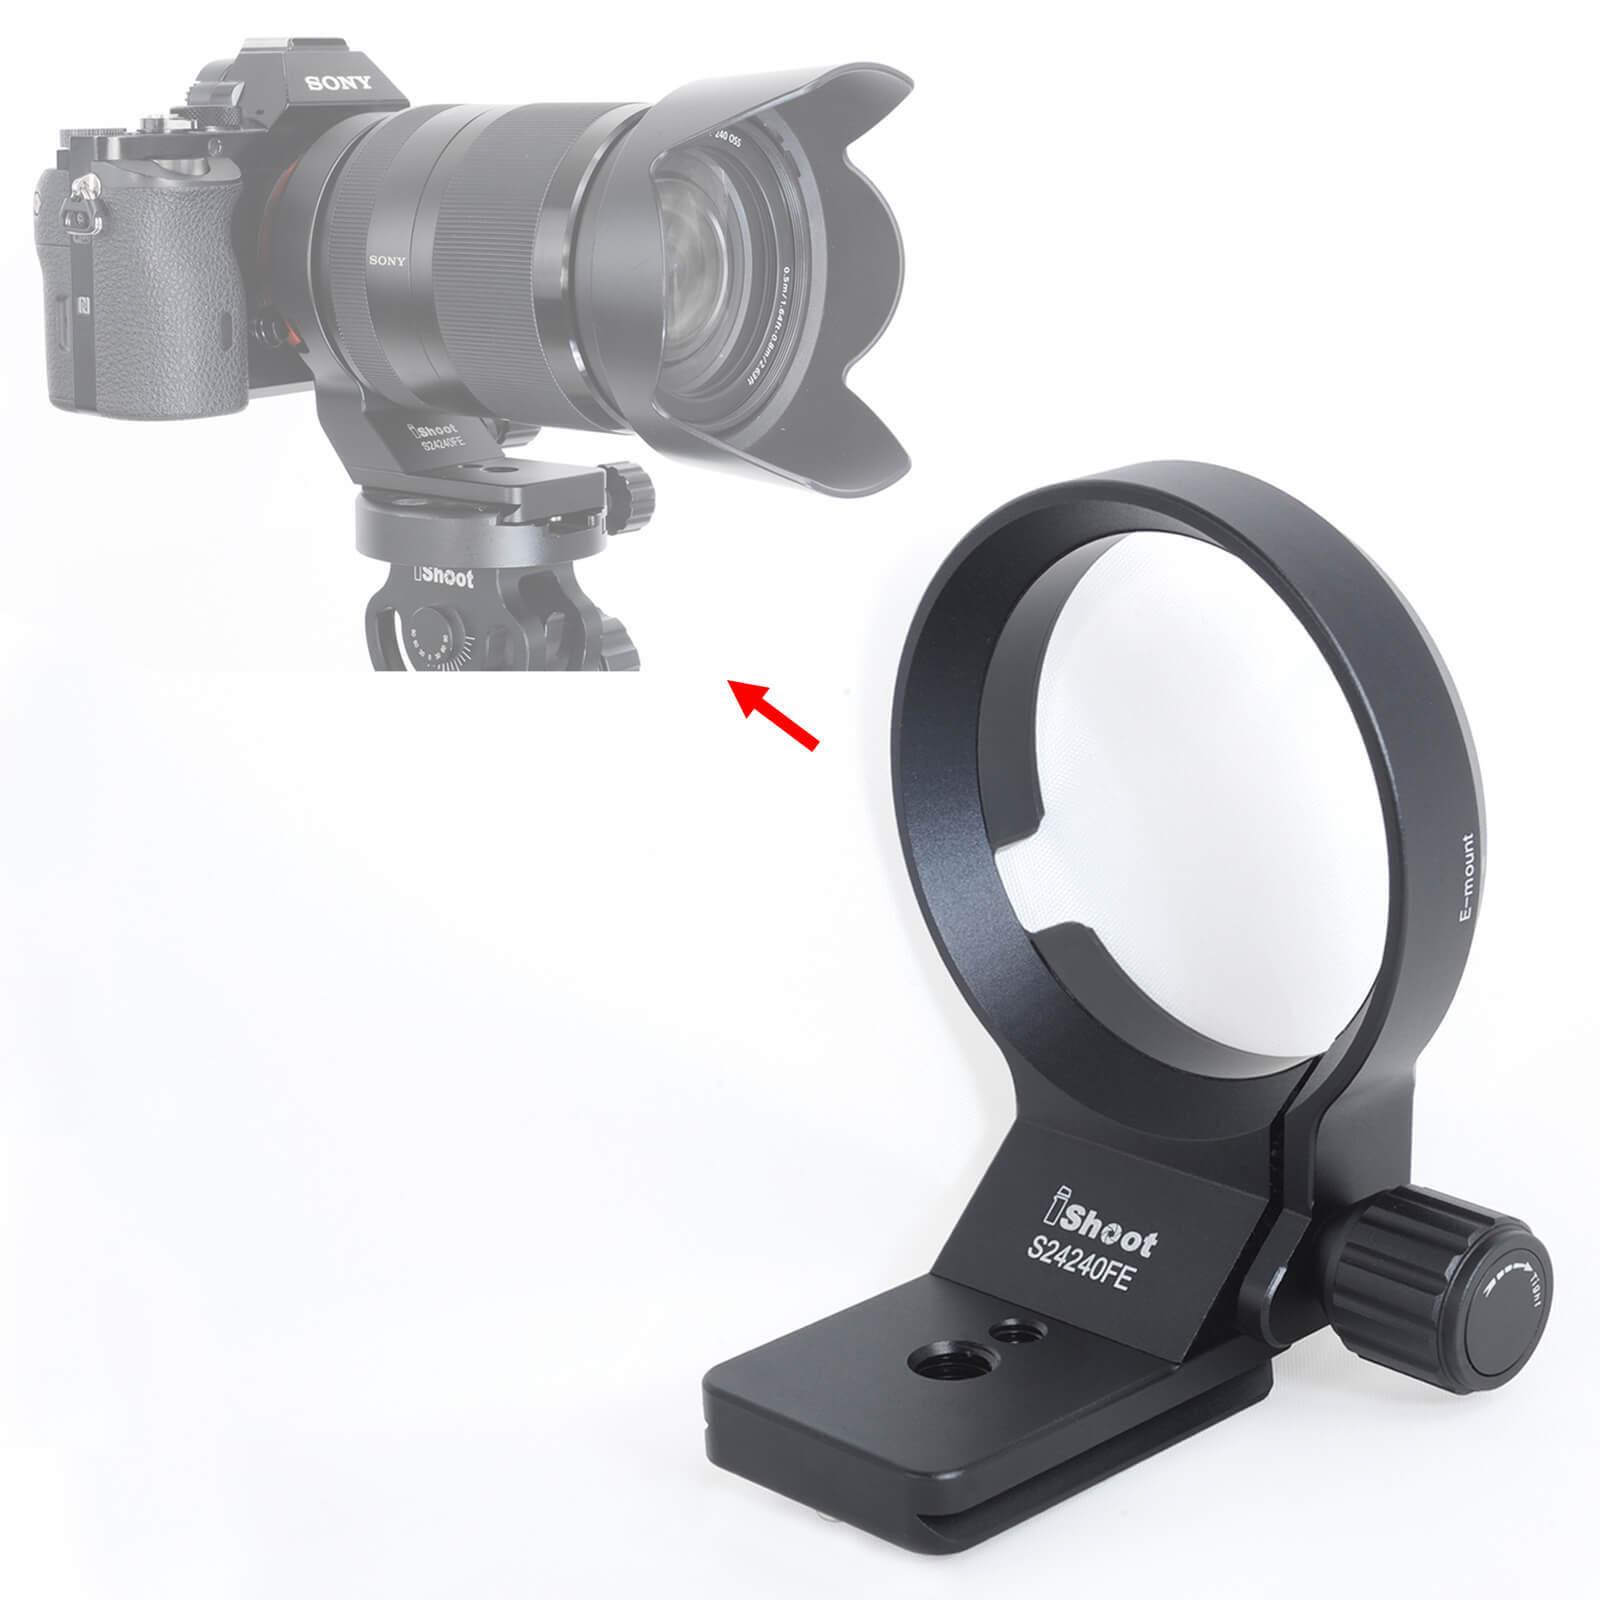 Tripod Mount Ring for Sony FE 90mm F2.8 Macro G OSS, FE 100mm F2.8 STF GM OSS